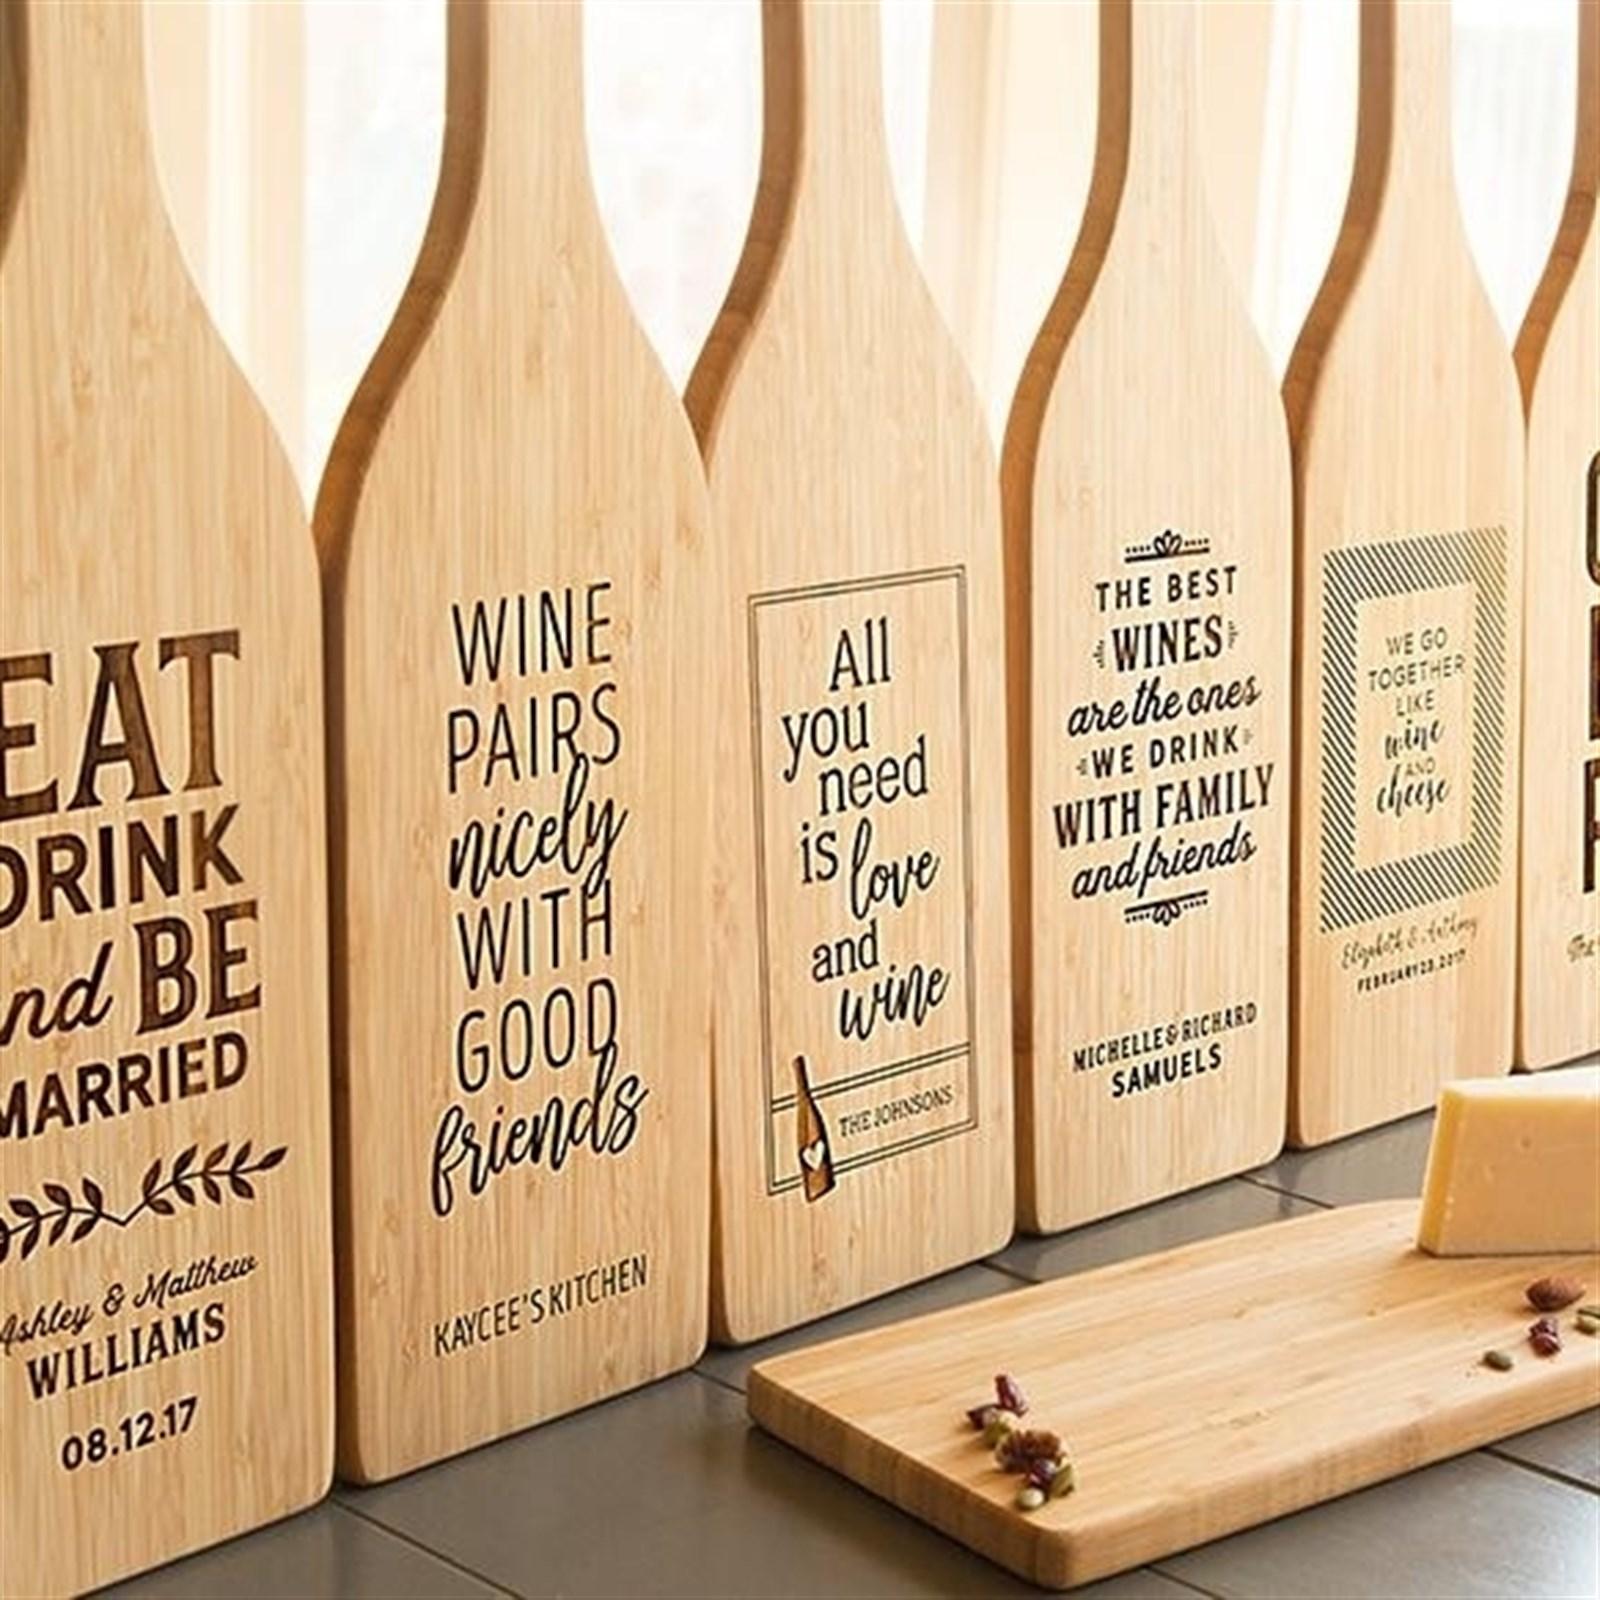 Personalized Cutting Board Custom Cutting Board Housewarming Family Kitchen 11 x 14 Bamboo Wood --6000 Engraved Cutting Board